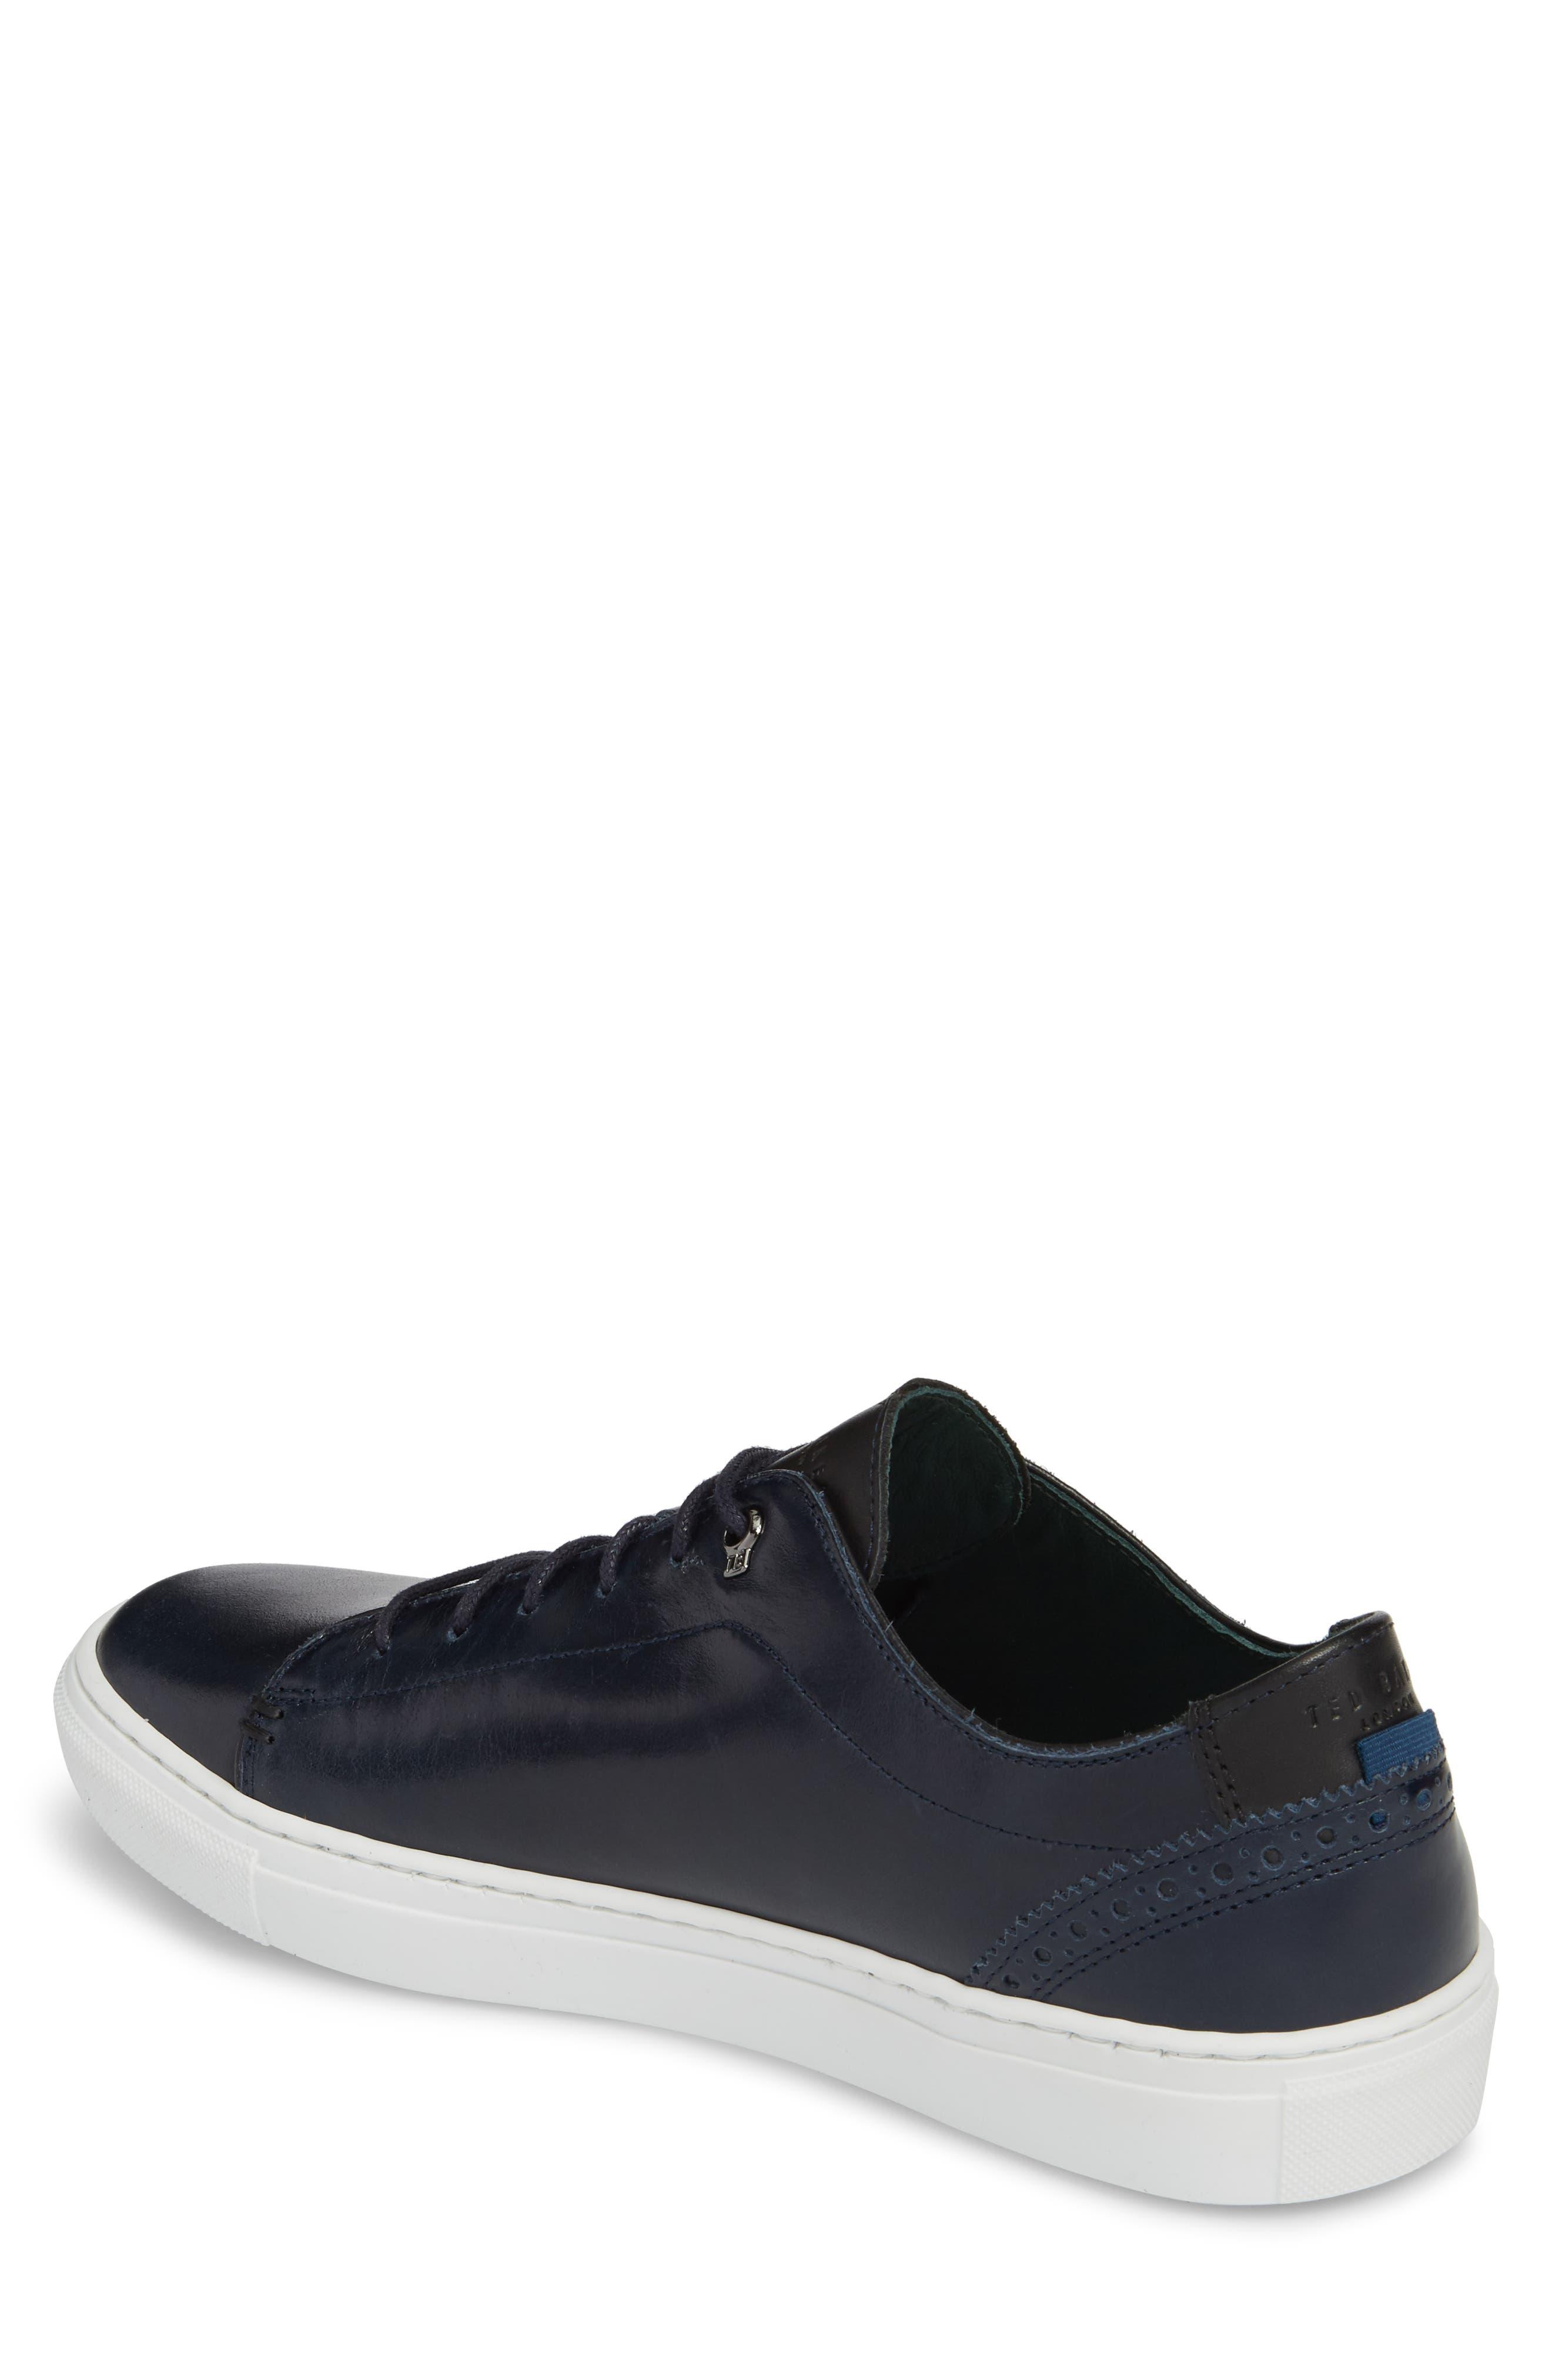 Duuke 2 Sneaker,                             Alternate thumbnail 2, color,                             Midnight Blue Leather